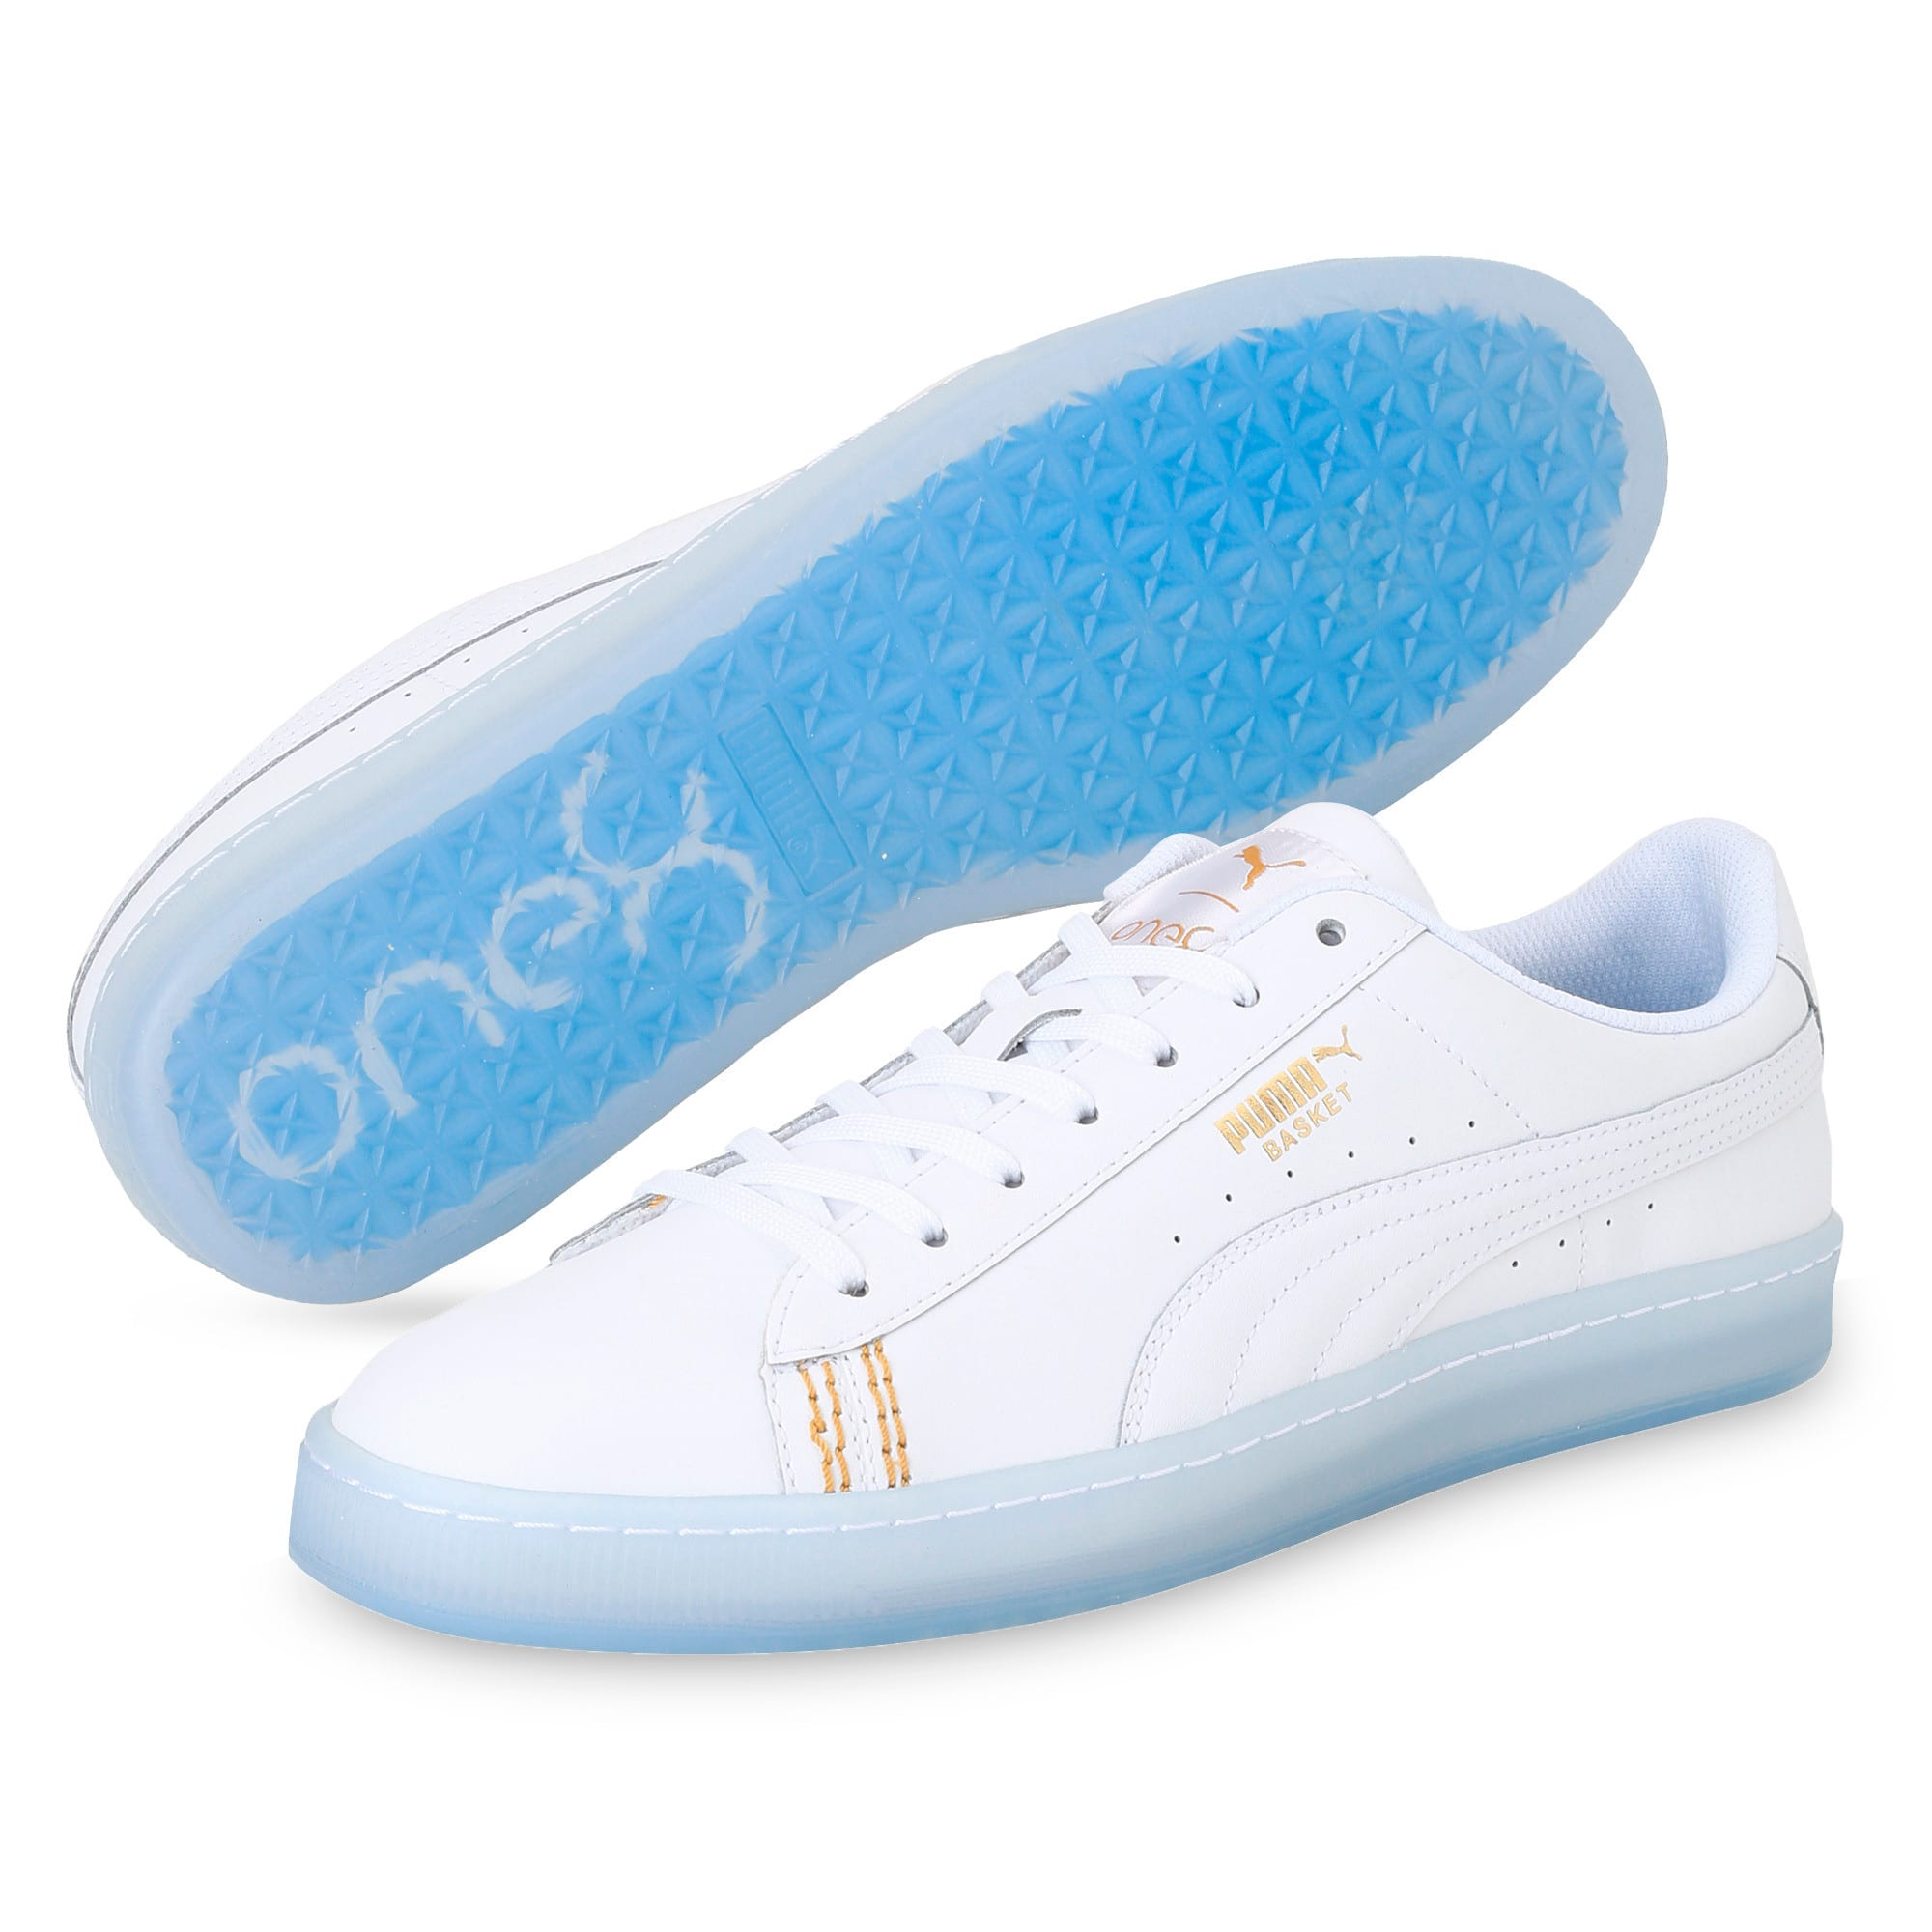 Thumbnail 2 of Basket Classic one8 Unisex Sneakers, White-Team Gold-Bleu Azur, medium-IND